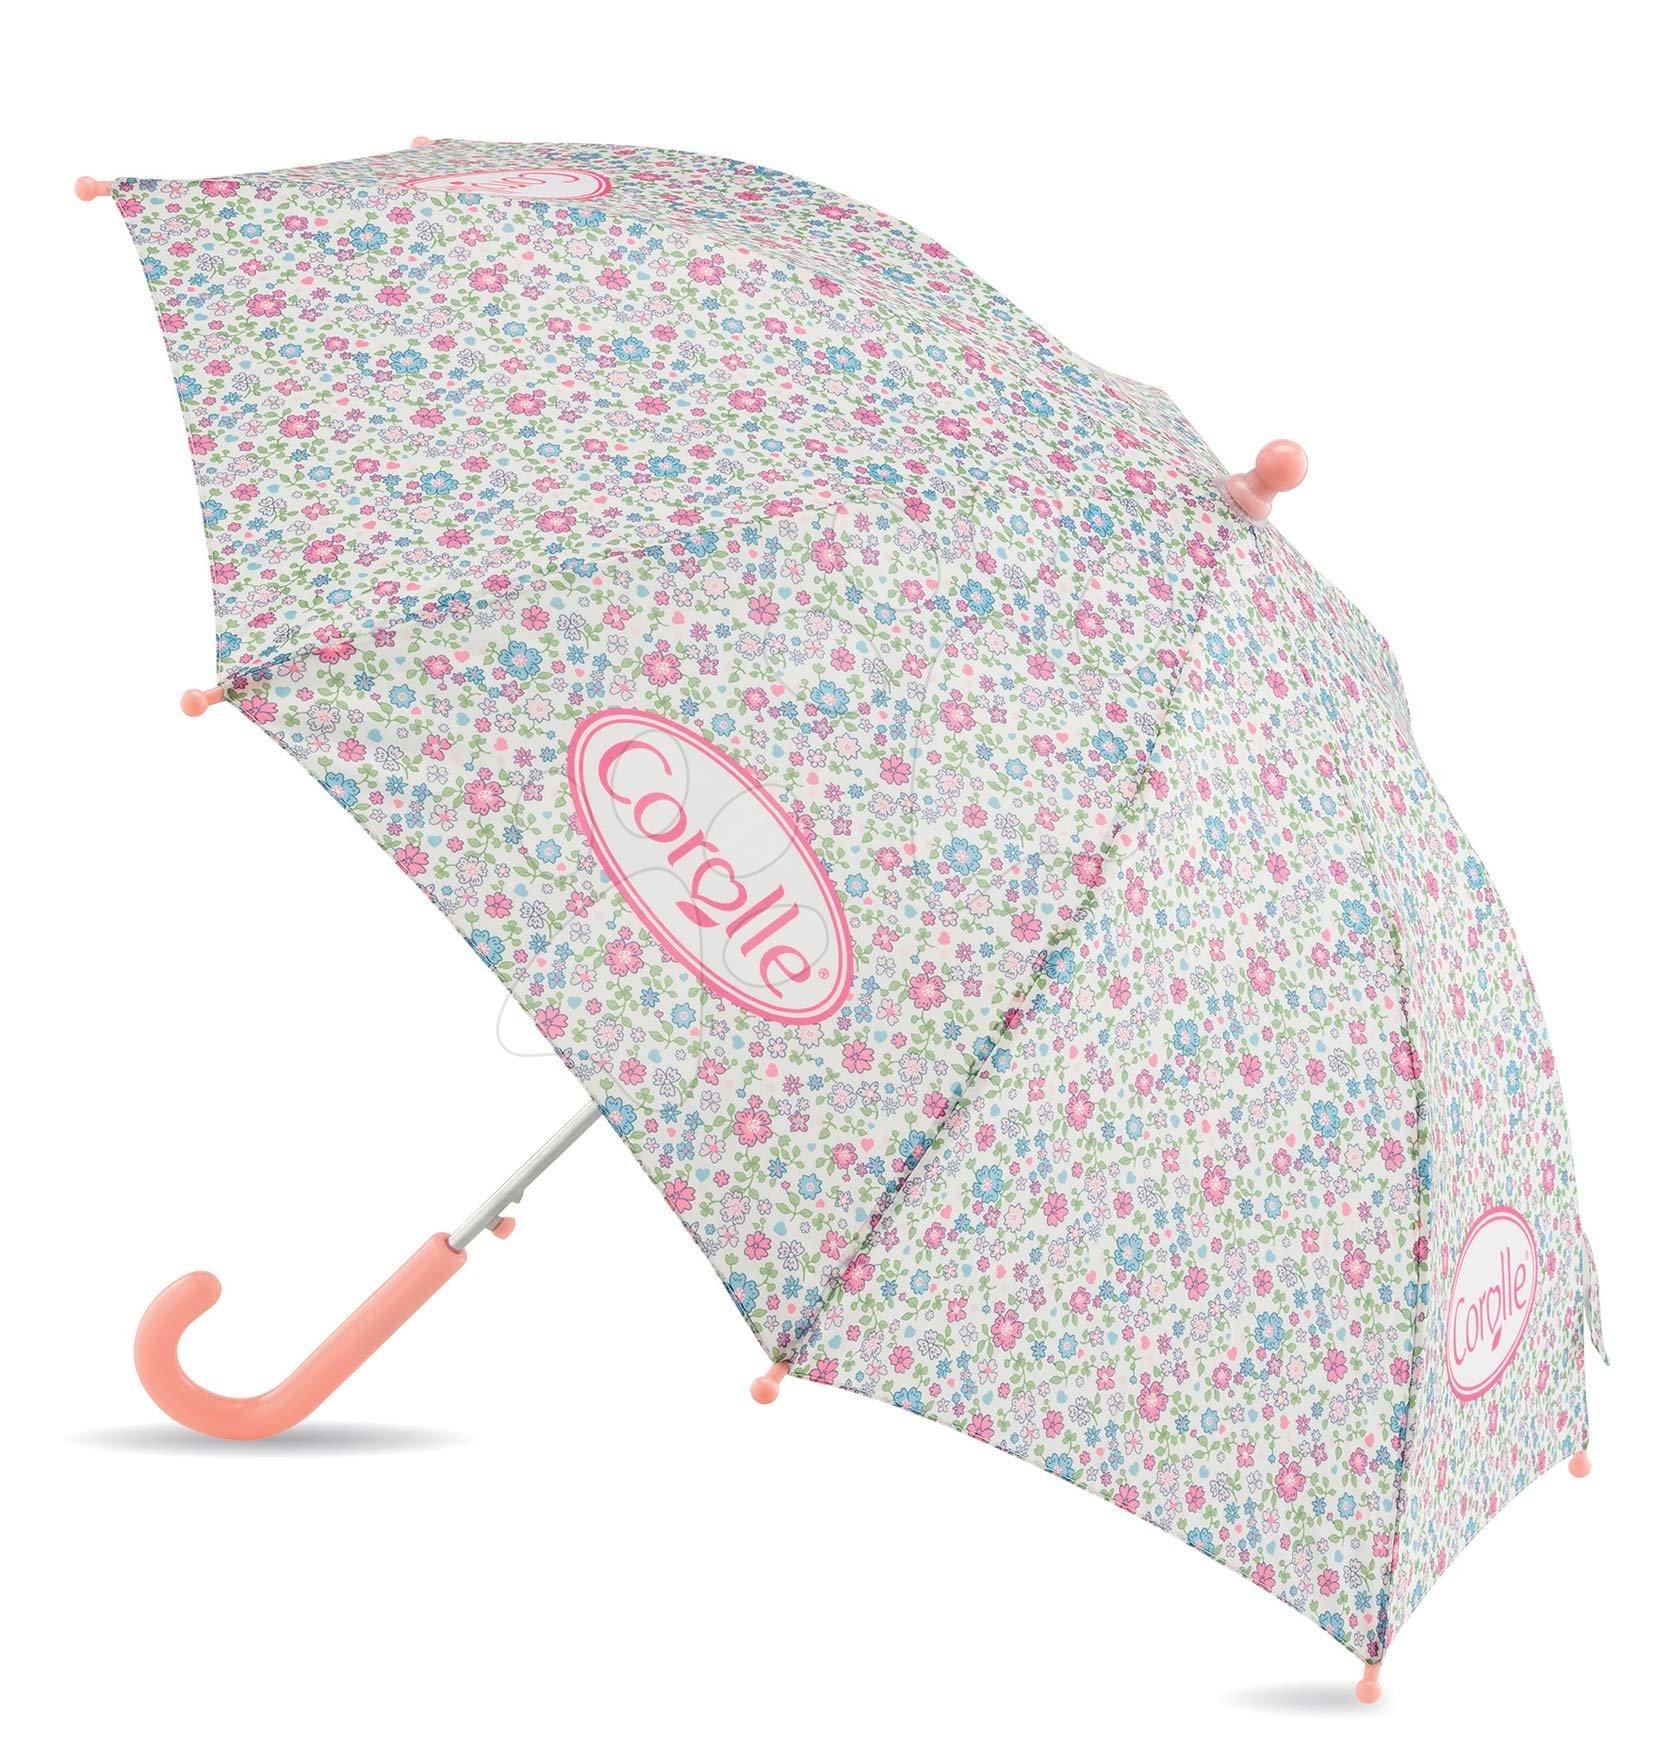 Dáždnik kvetinový Flowers Umbrella Les Bagages Corolle 62 cm rúčka a 83 cm priemer